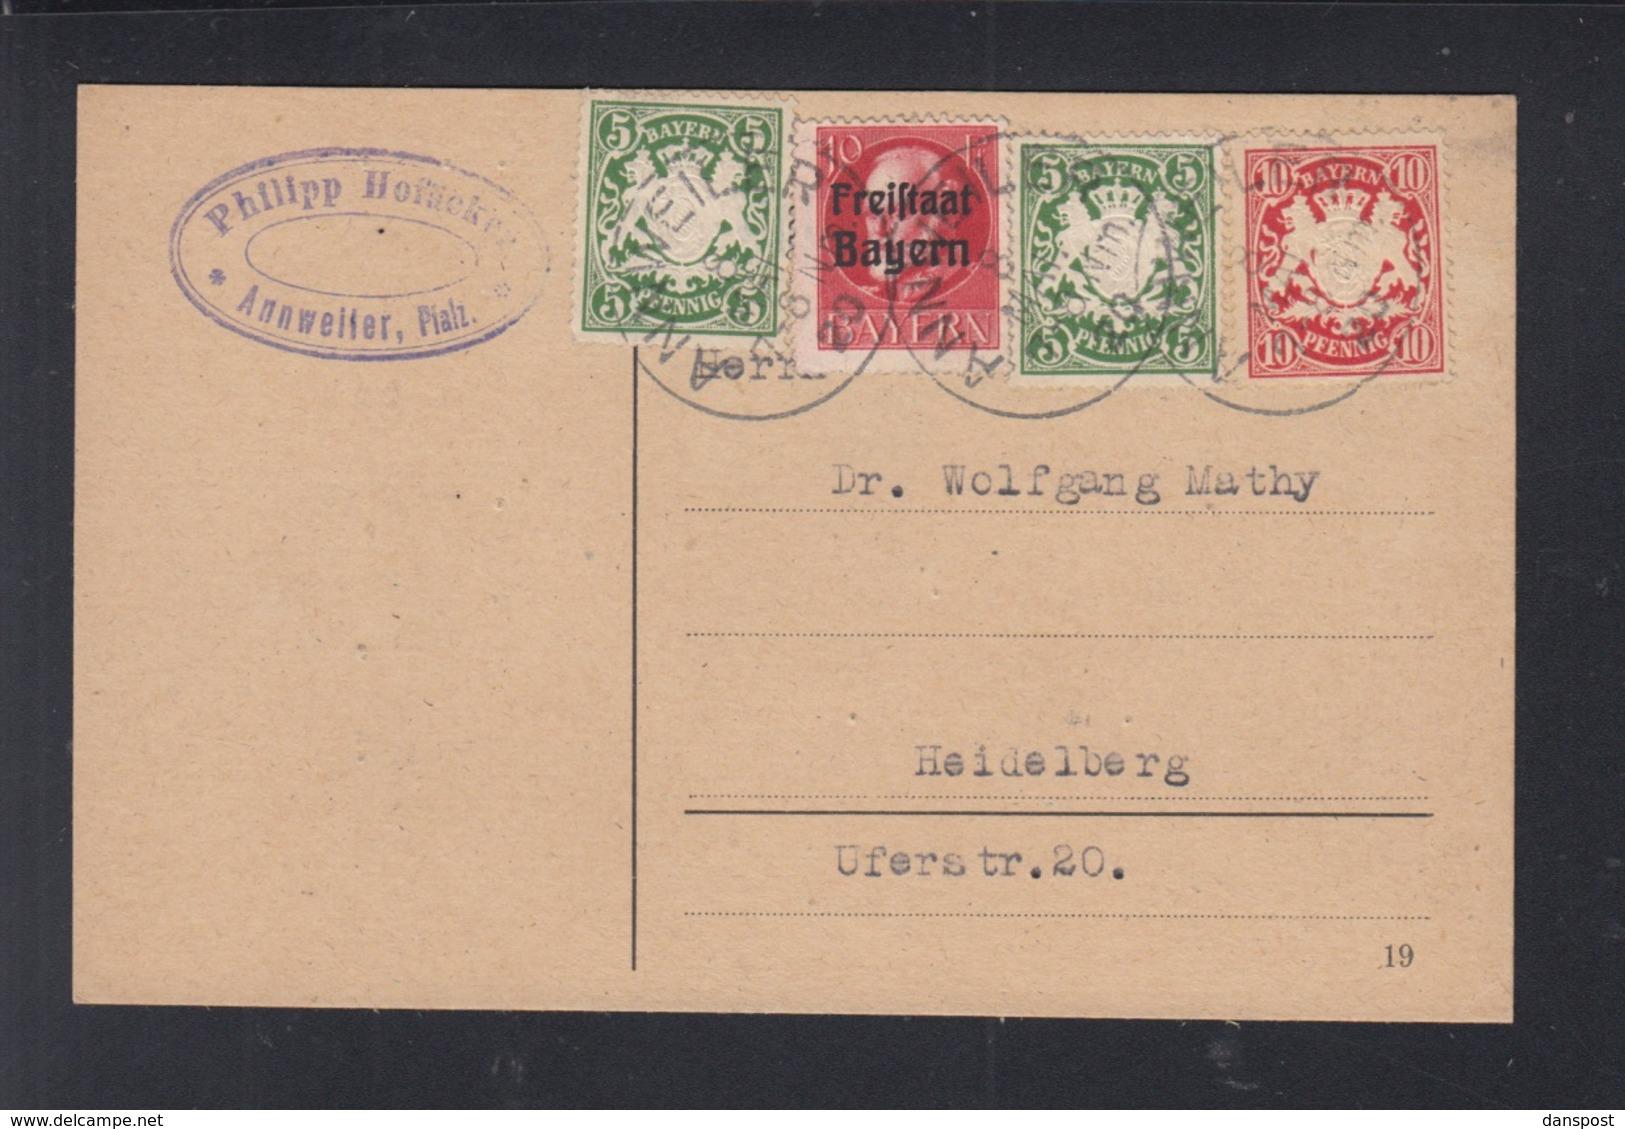 Bayern PK 1920 Anweiler Nach Heidelberg - Bayern